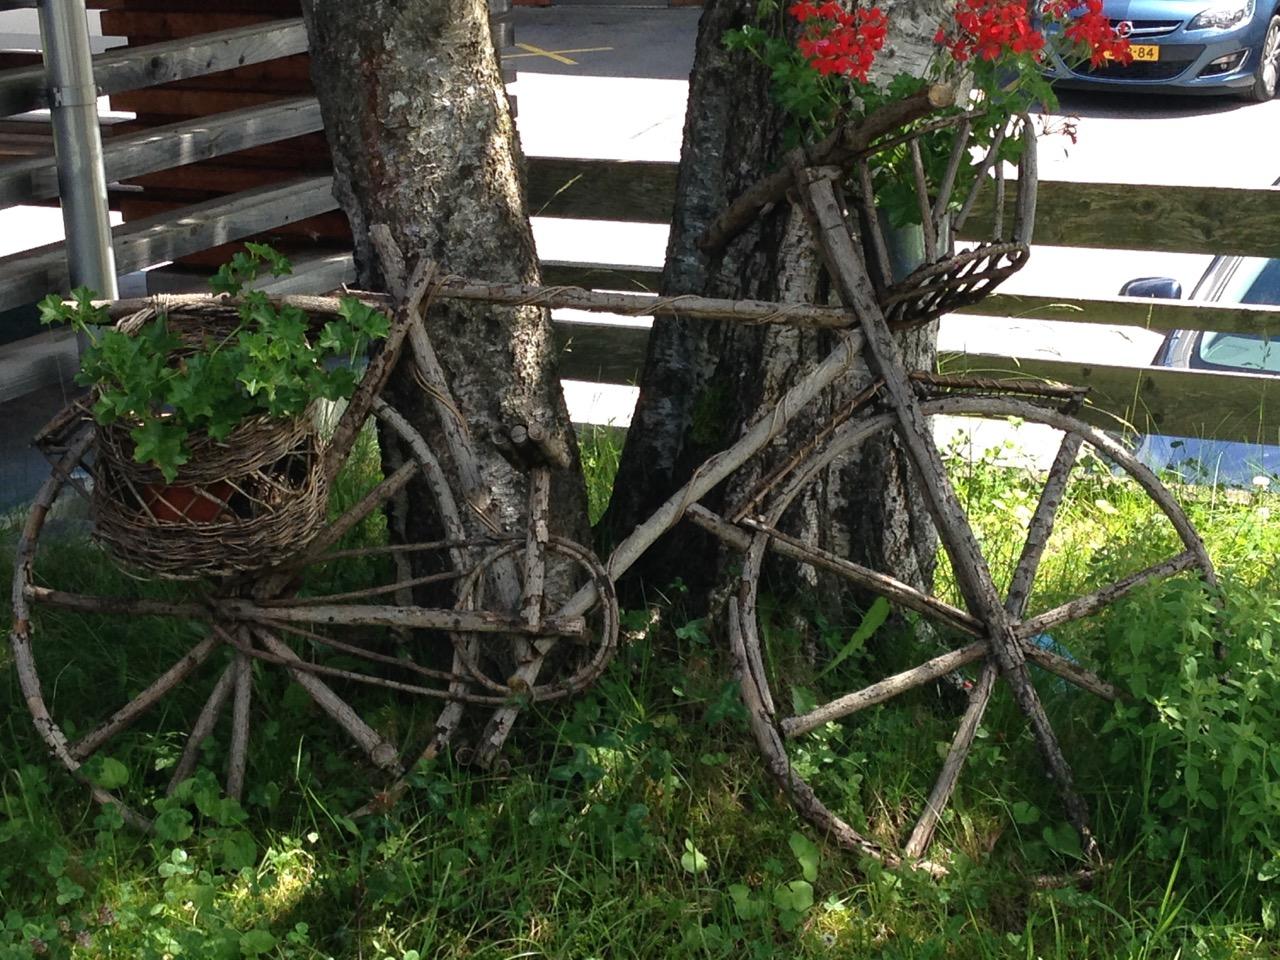 Picture of Stick Bike